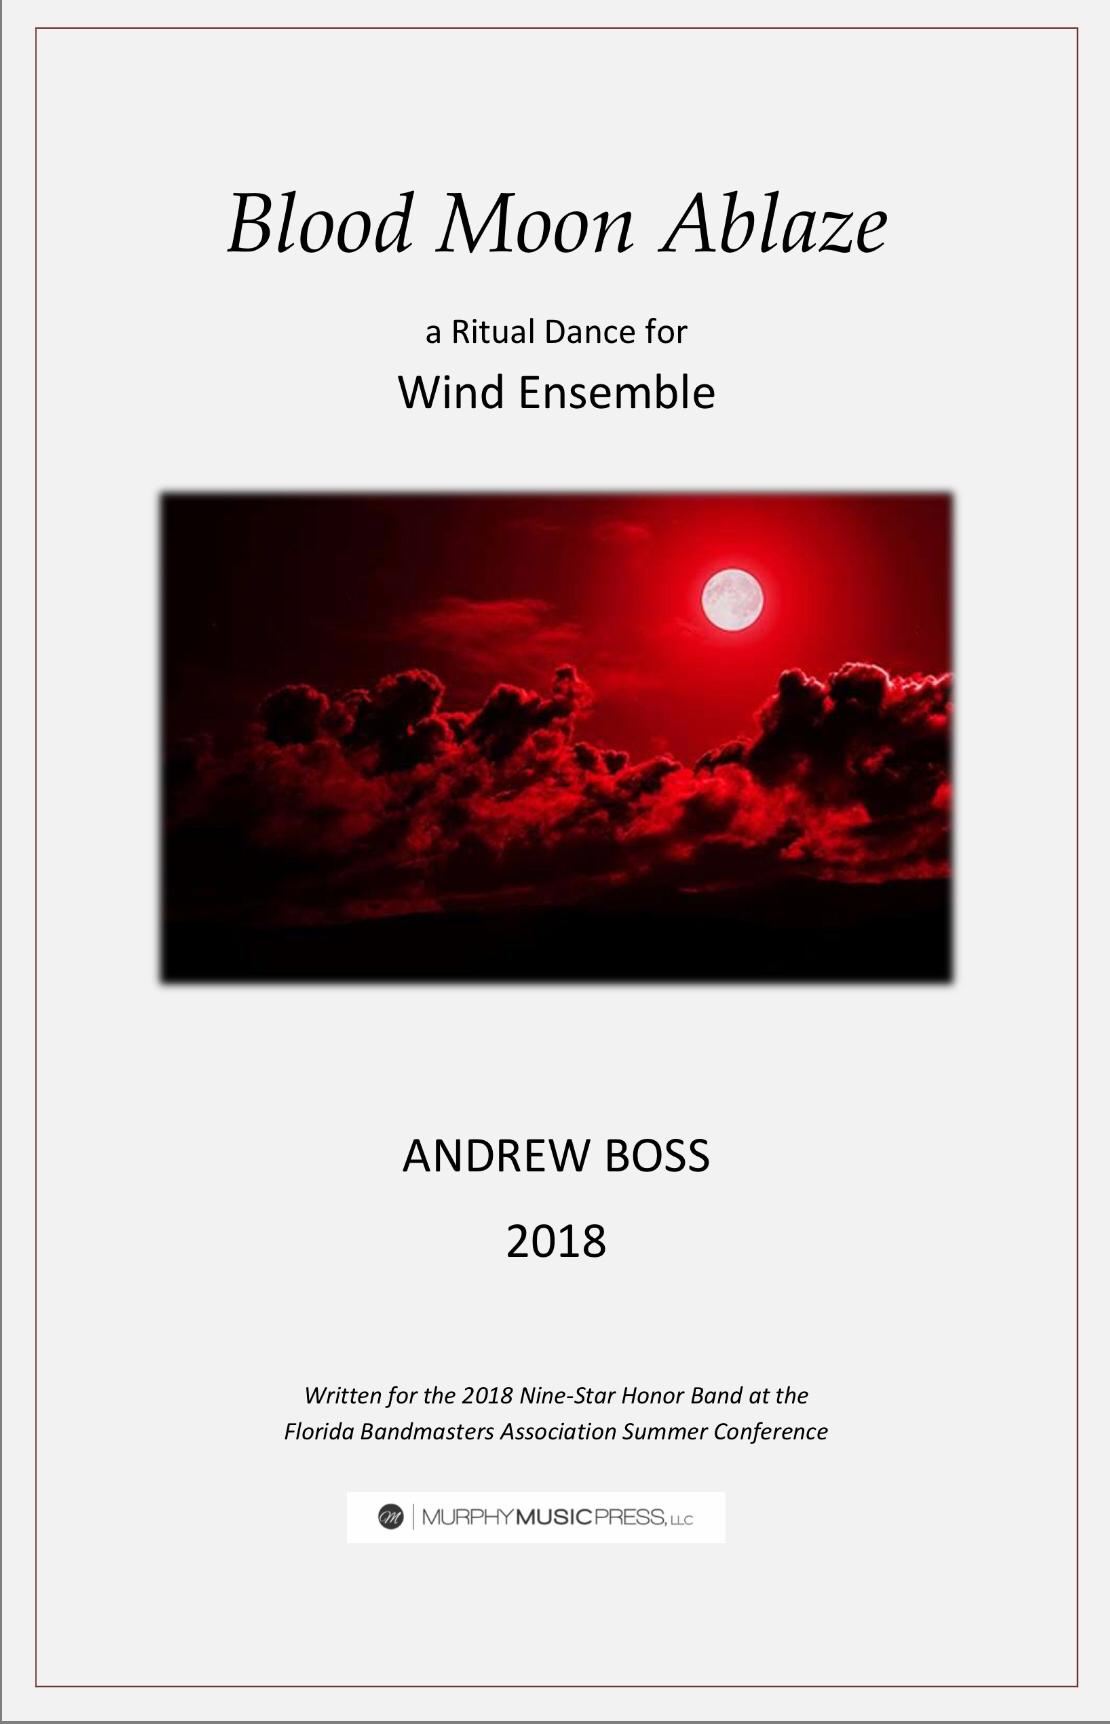 Blood Moon Ablaze by Andrew Boss